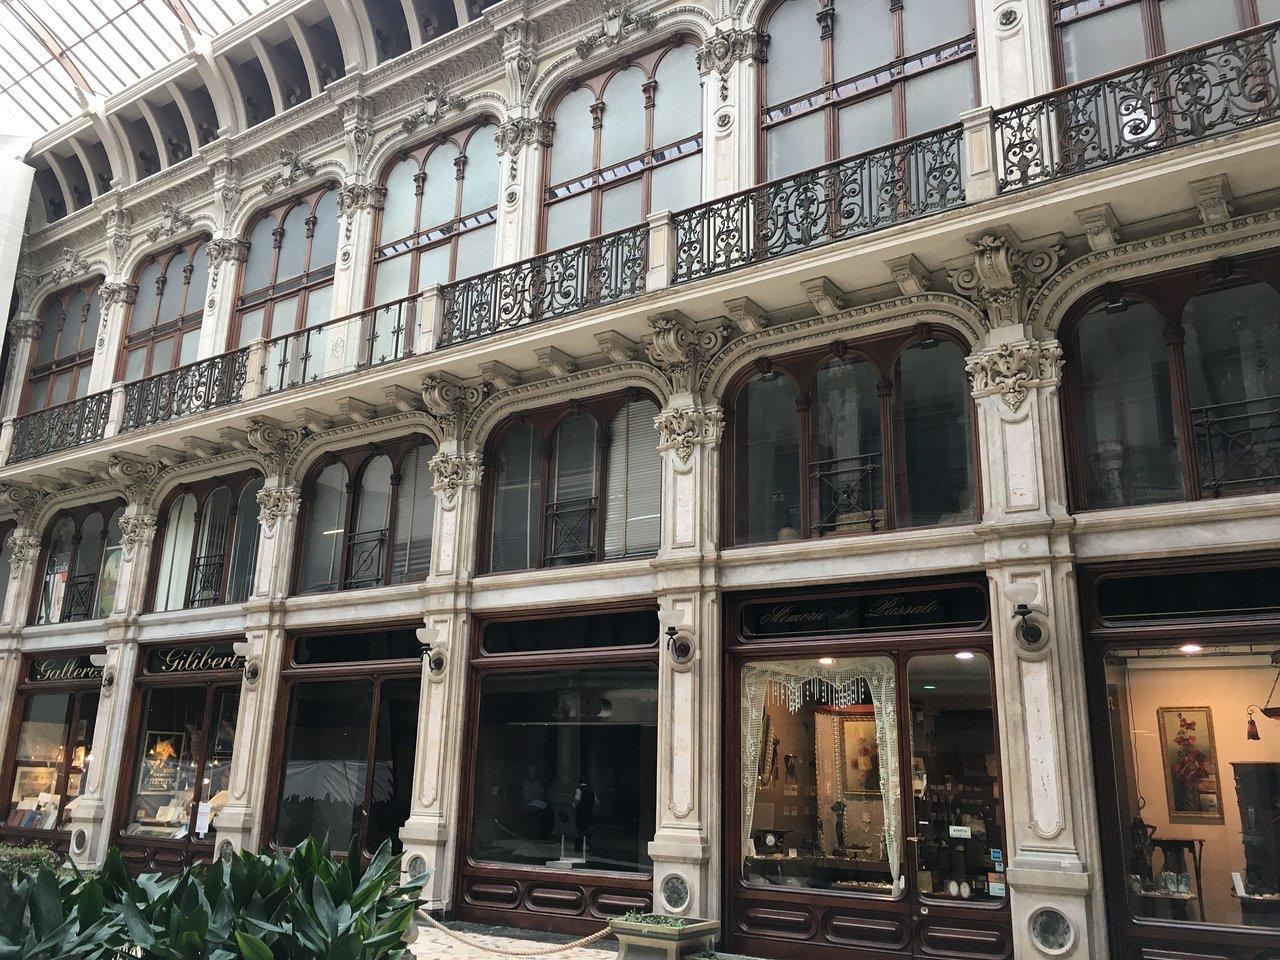 Galleria Subalpina Torino Italija Komentari Tripadvisor